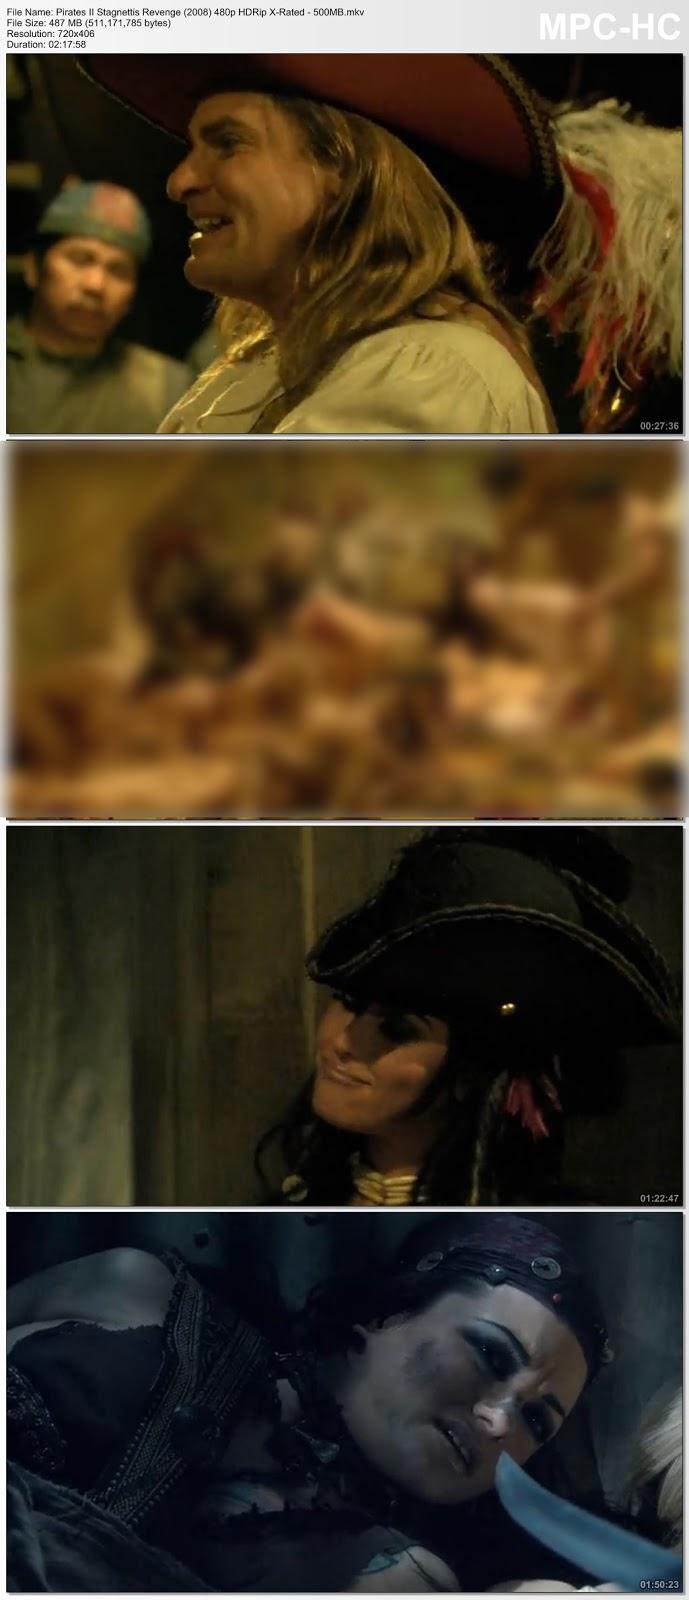 [18+] Pirates II Stagnetti's Revenge (2008) 480p BRRip X-Rated – 500MB Desirehub